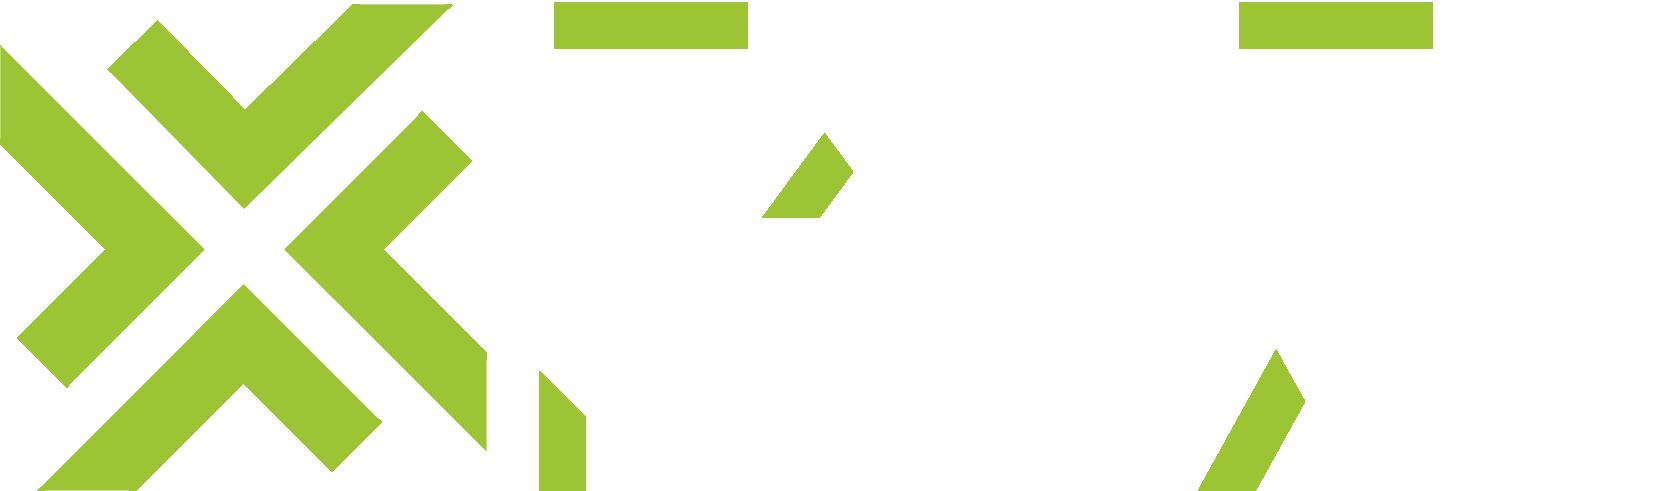 http://www.excelmudah.com